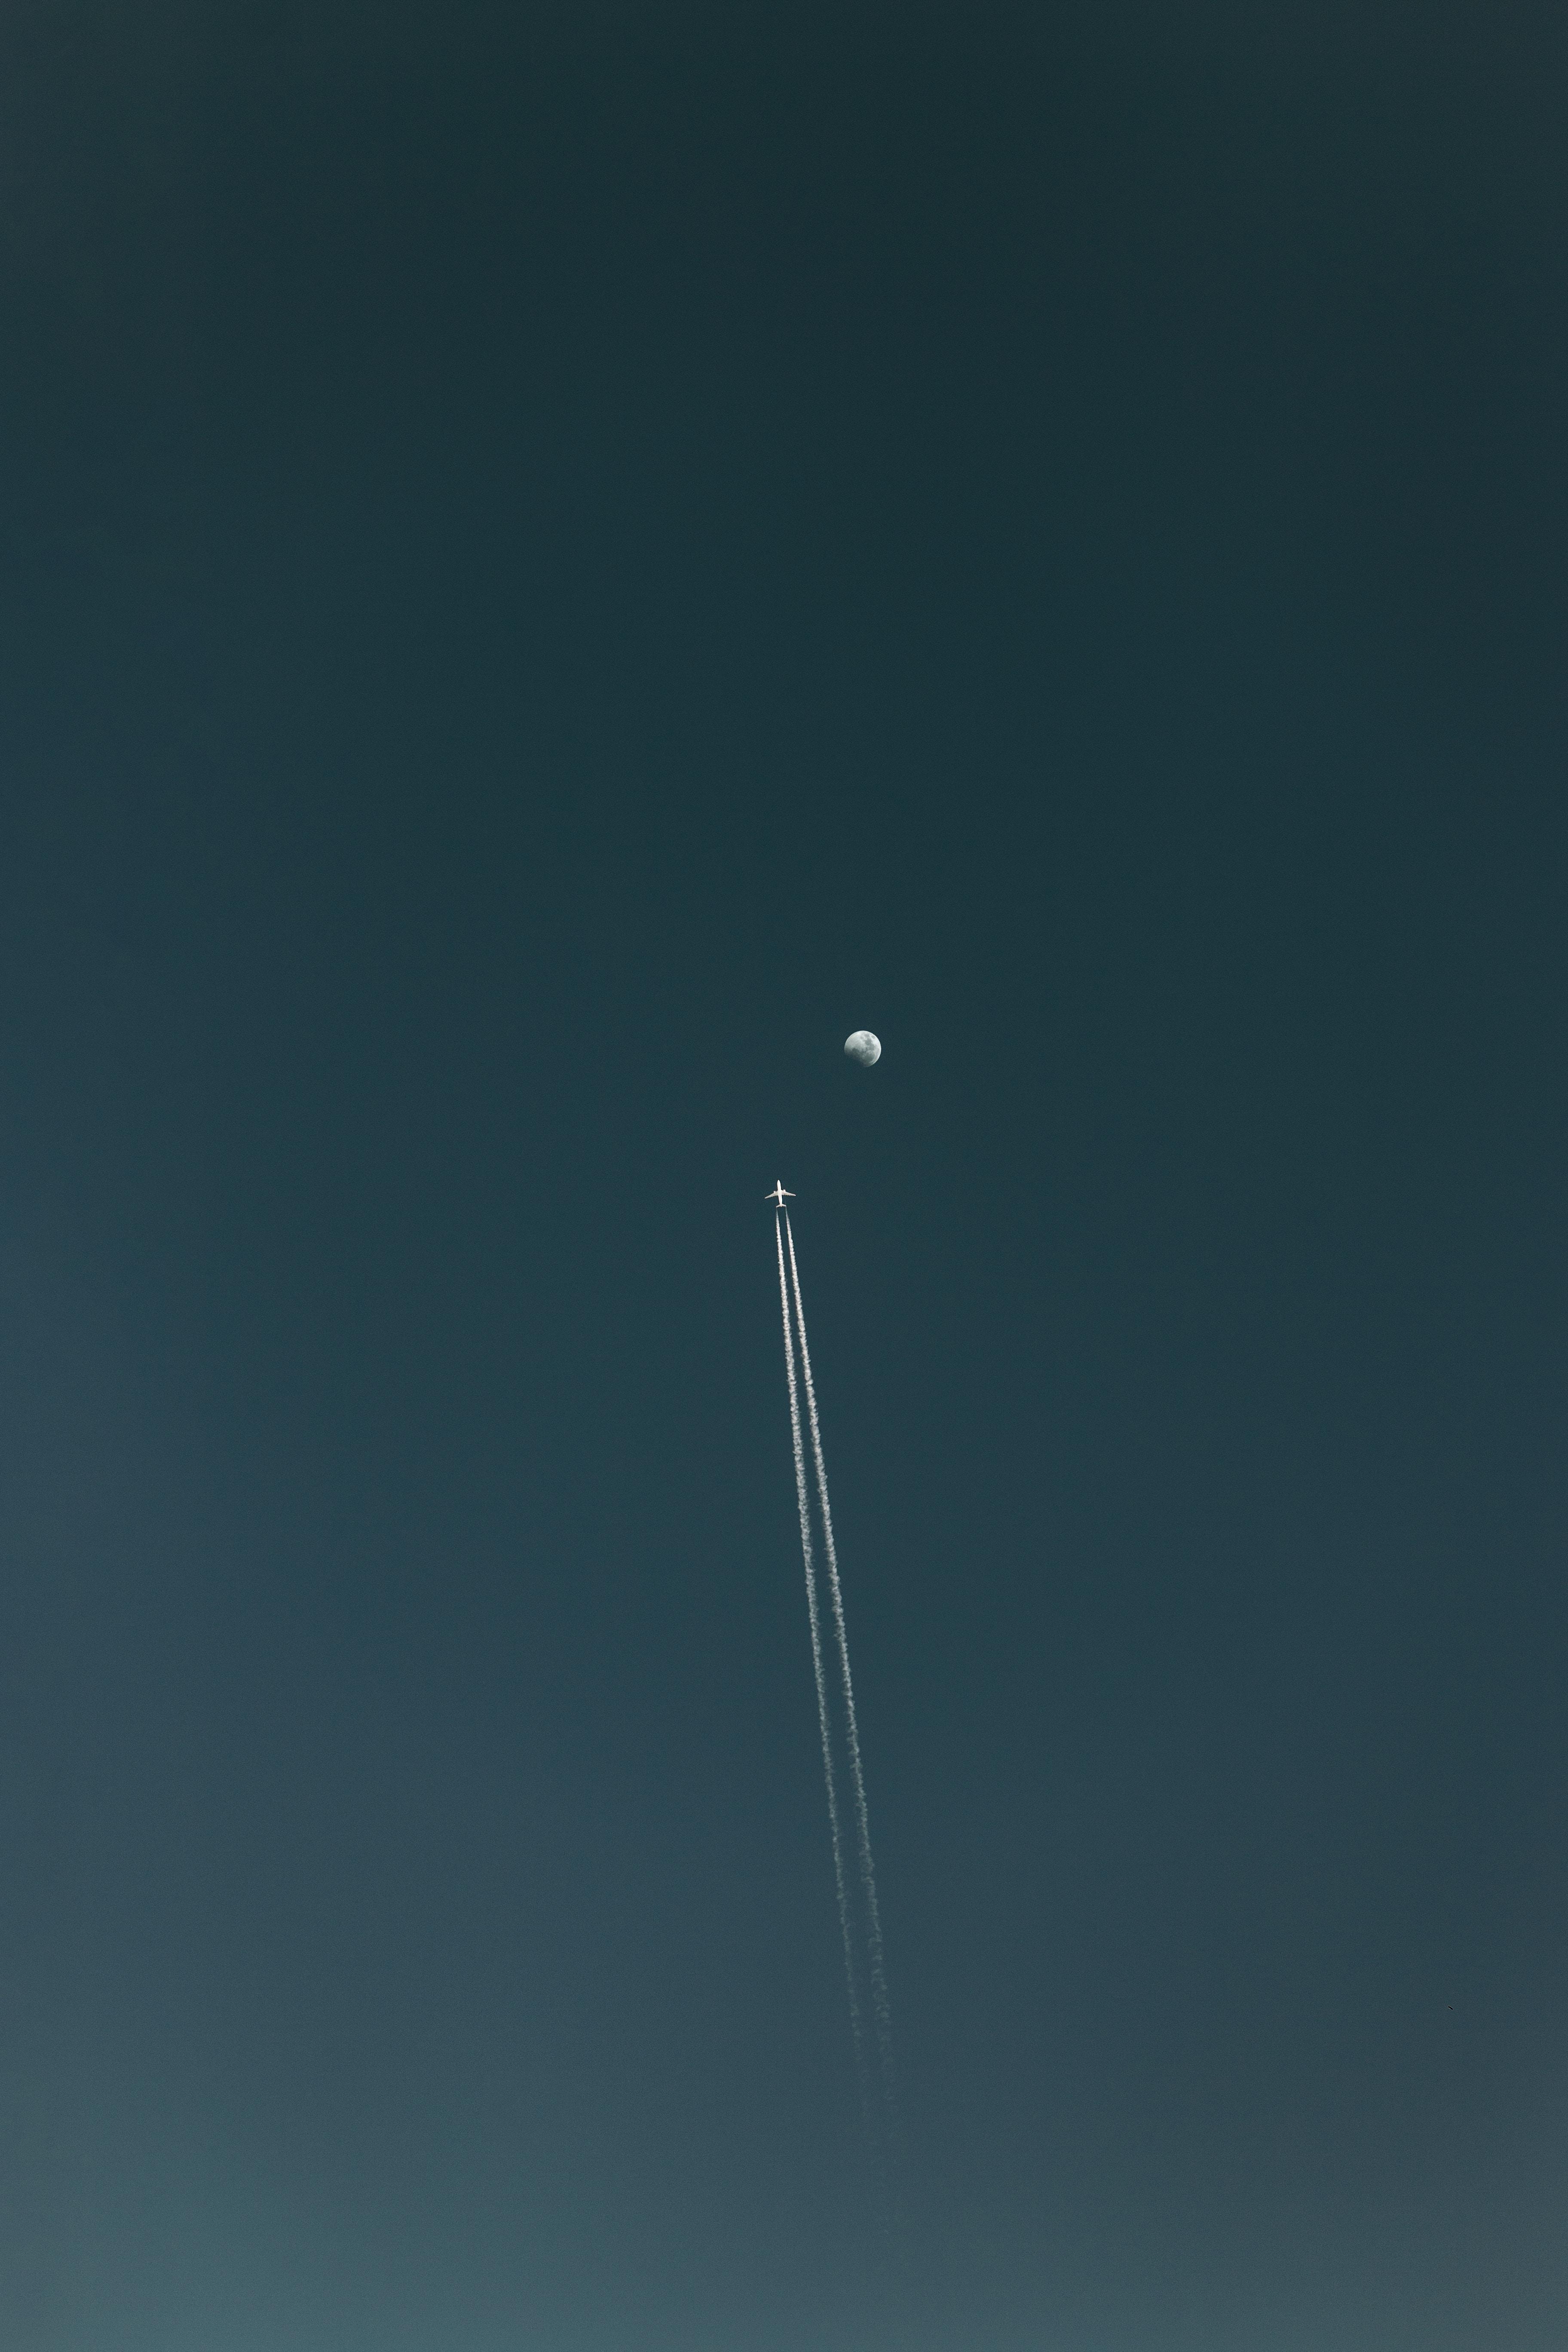 134098 descargar fondo de pantalla Minimalismo, Avión, Luna, Cielo, Vuelo, Pista, Rastro: protectores de pantalla e imágenes gratis